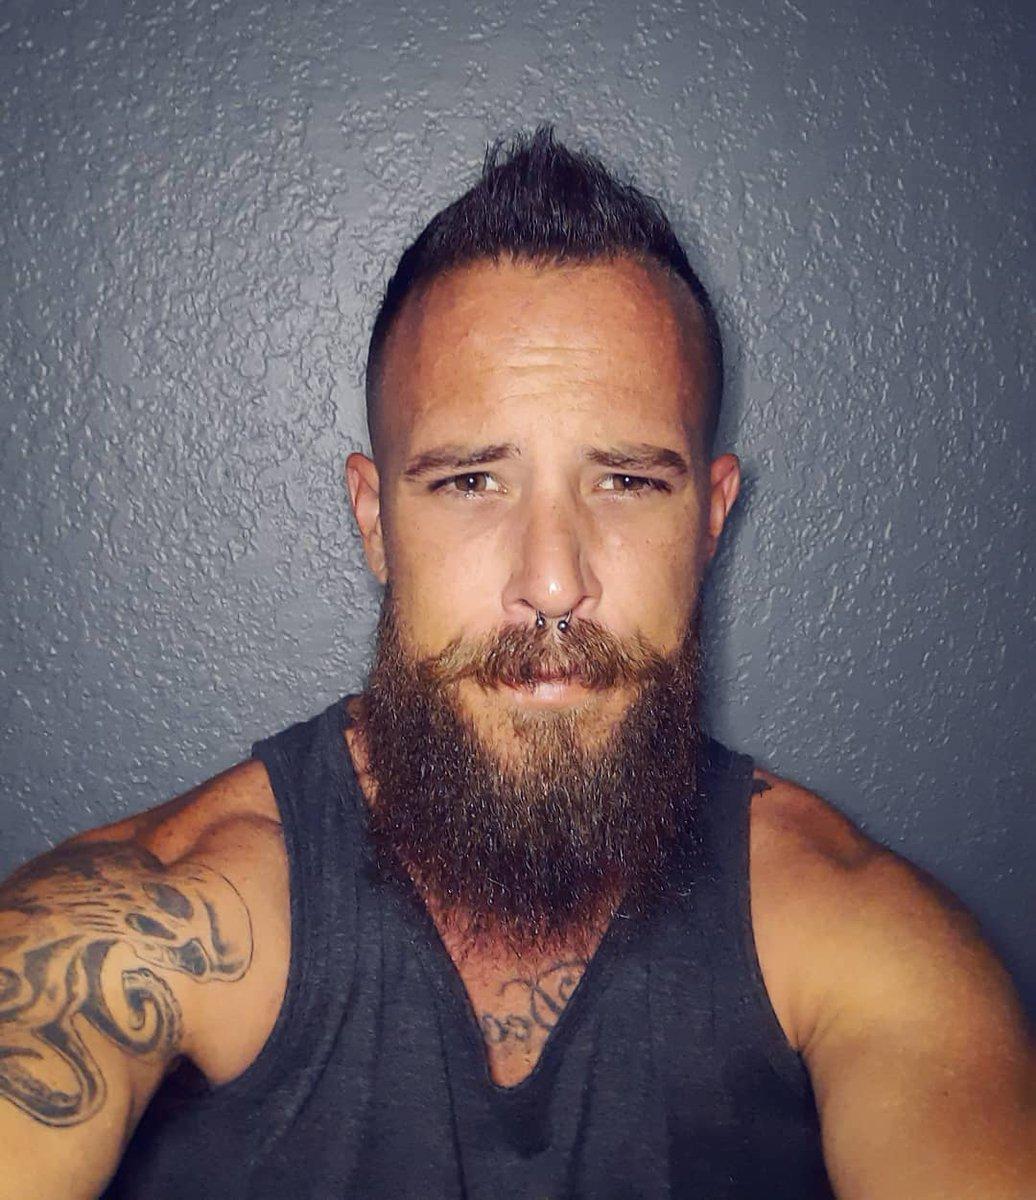 Do not Pray for an Easy Life, Pray for the Strength to Endure a Difficult One. •BL • • • #beard #beards #bearded #beardeddad #beardedveteran #beardsandtattoos #beardsofinstagram #tattoo #tattoos #tattooedmen #beardedmen #floridalife #saturdayvibes #livebearded #stayswollpic.twitter.com/NubIK5xkG5